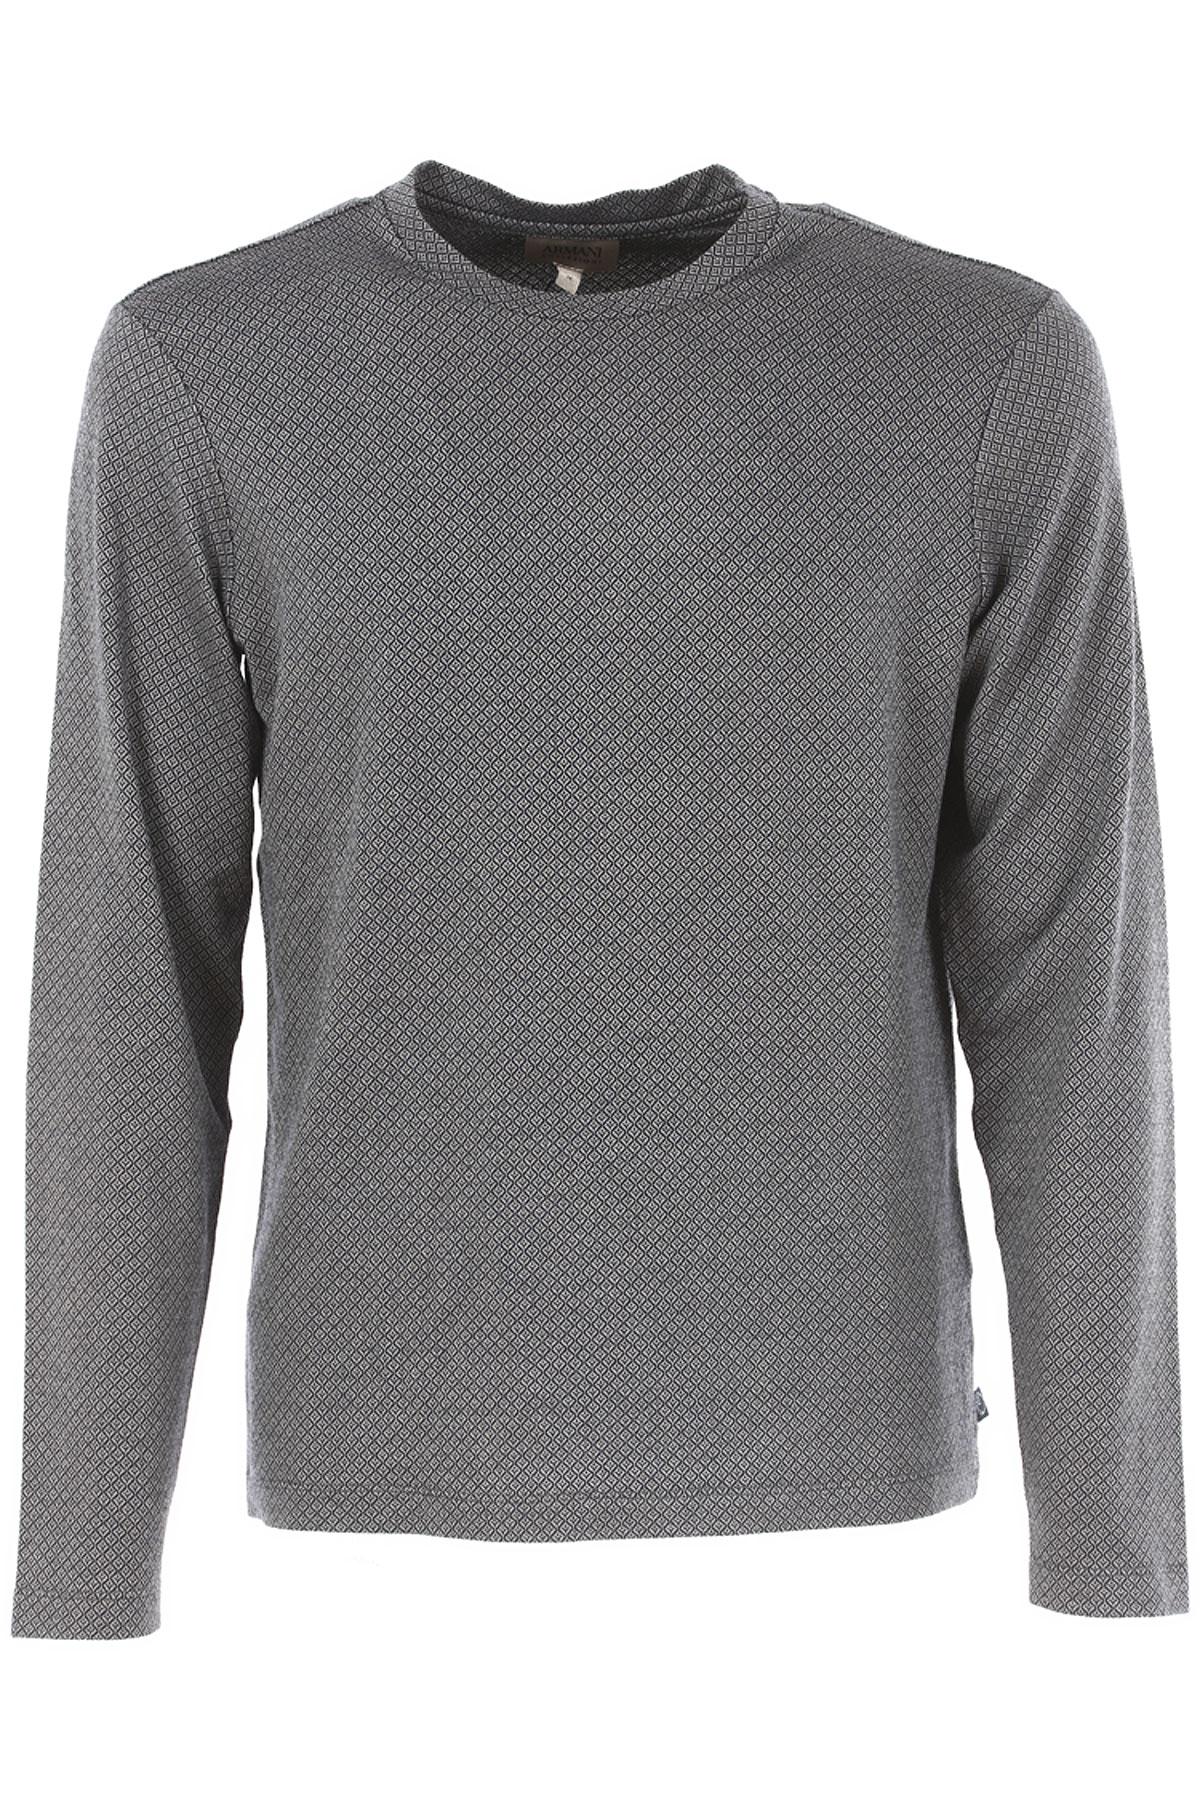 Emporio Armani T-Shirt for Men On Sale, Grey, Viscose, 2017, L M S XL XXL XXXL USA-385500